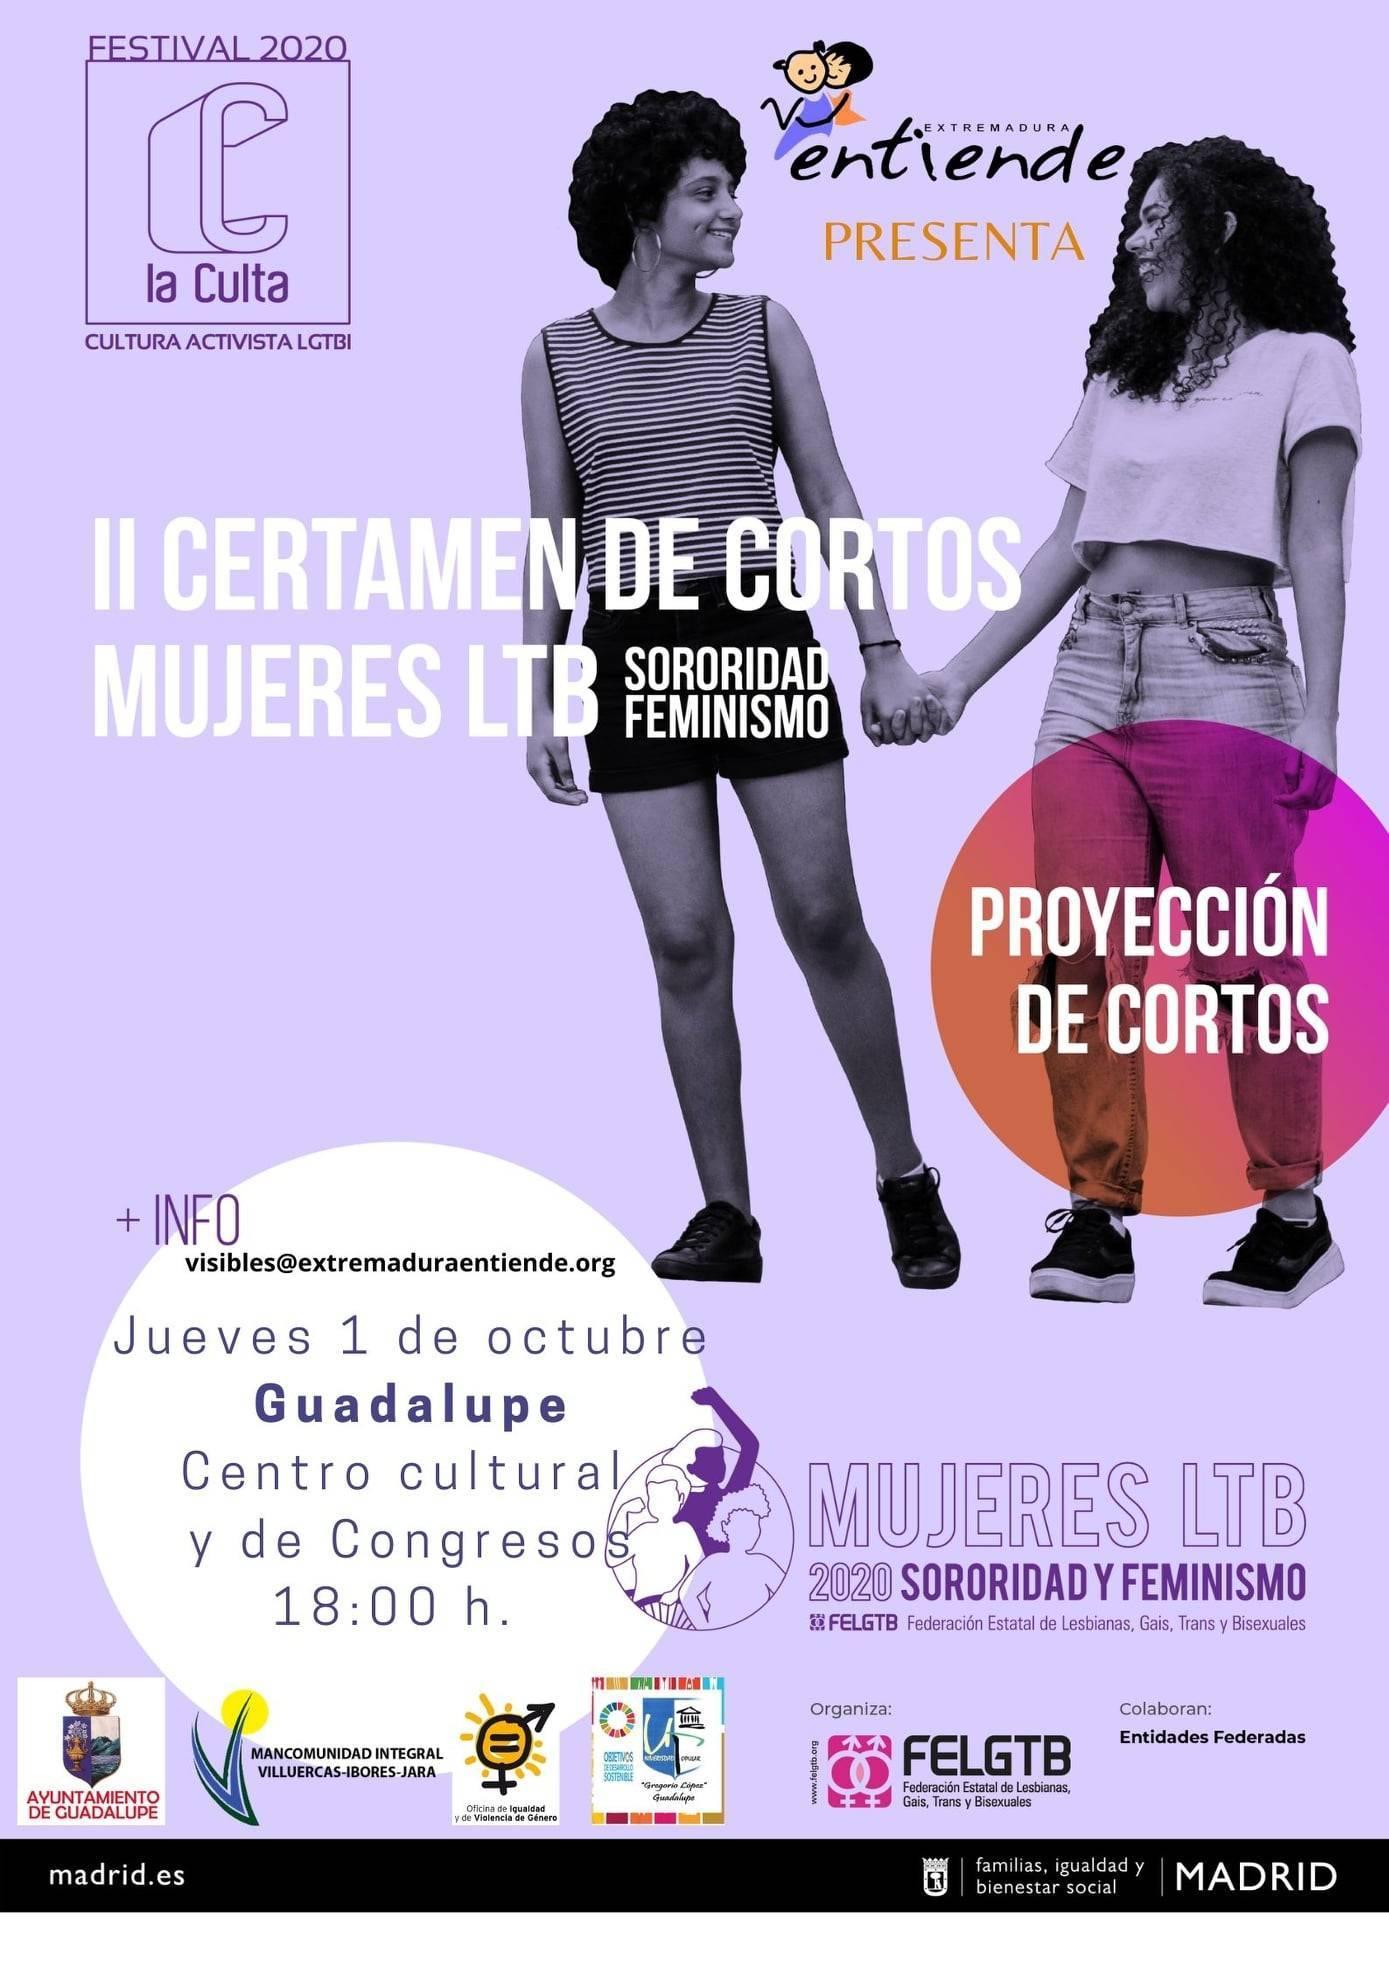 II certamen de cortos mujeres LTB - Guadalupe (Cáceres)